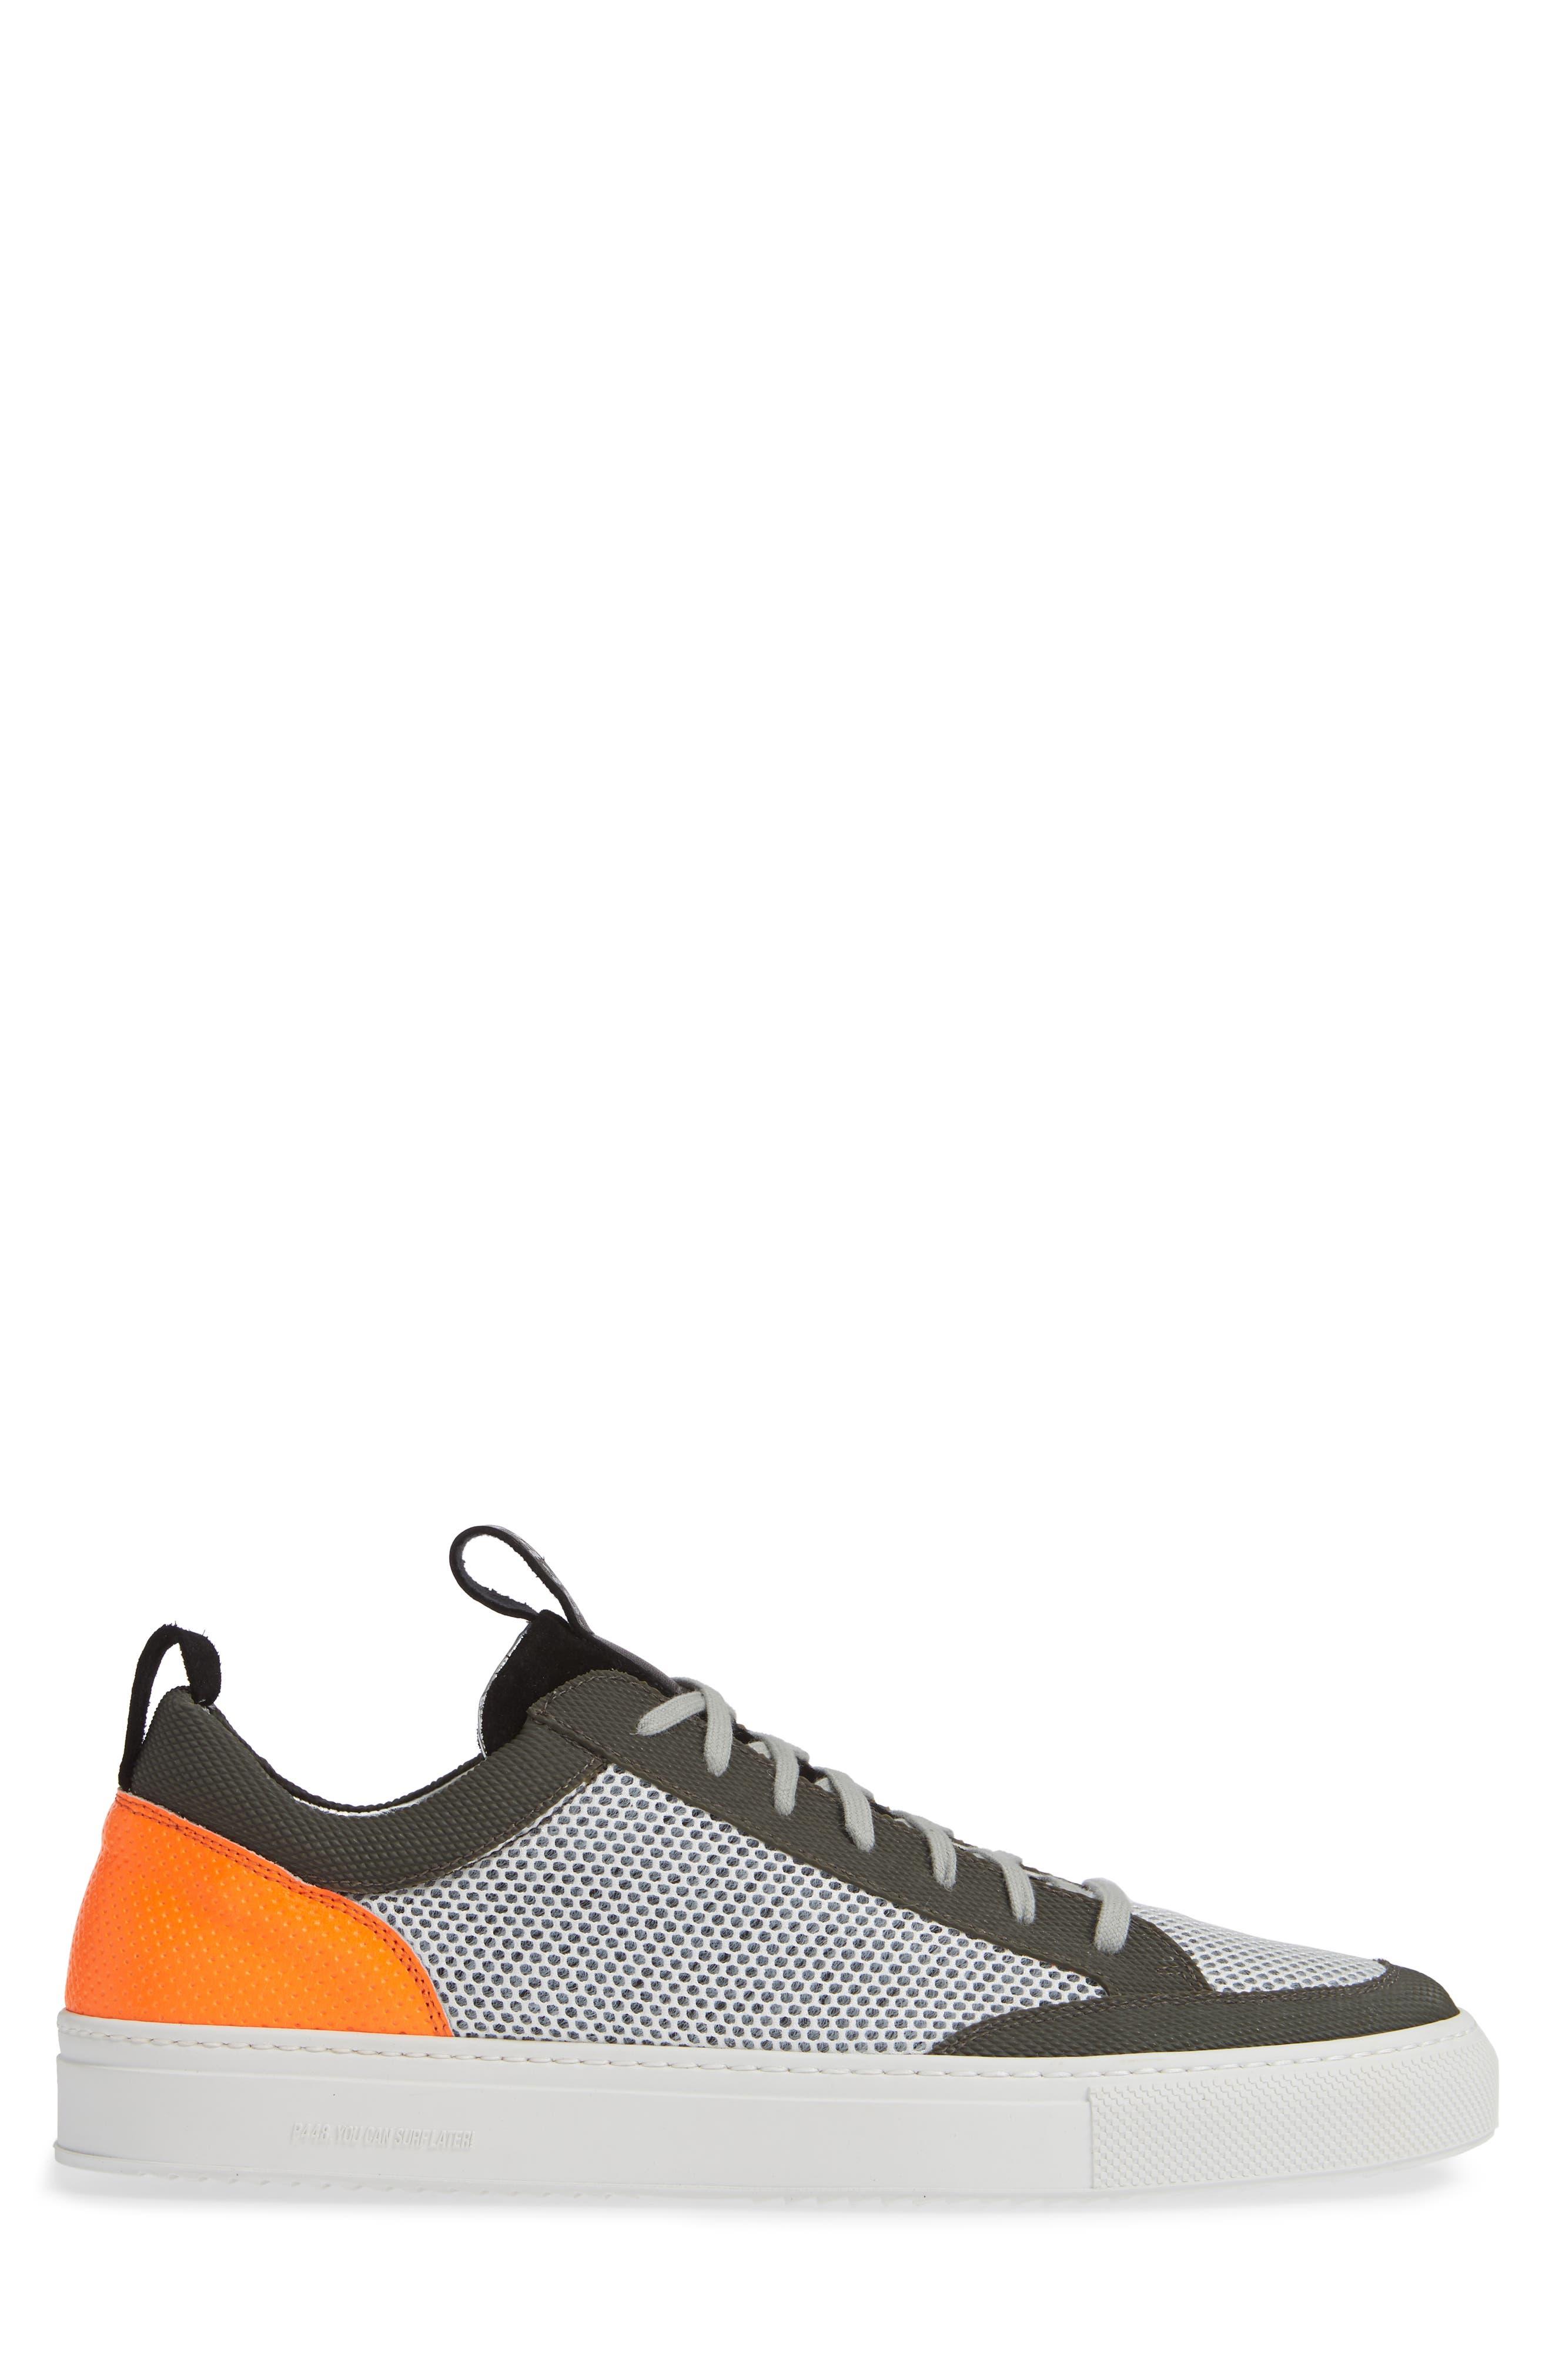 A8Soho Textured Sneaker,                             Alternate thumbnail 3, color,                             WHITE/ GREY